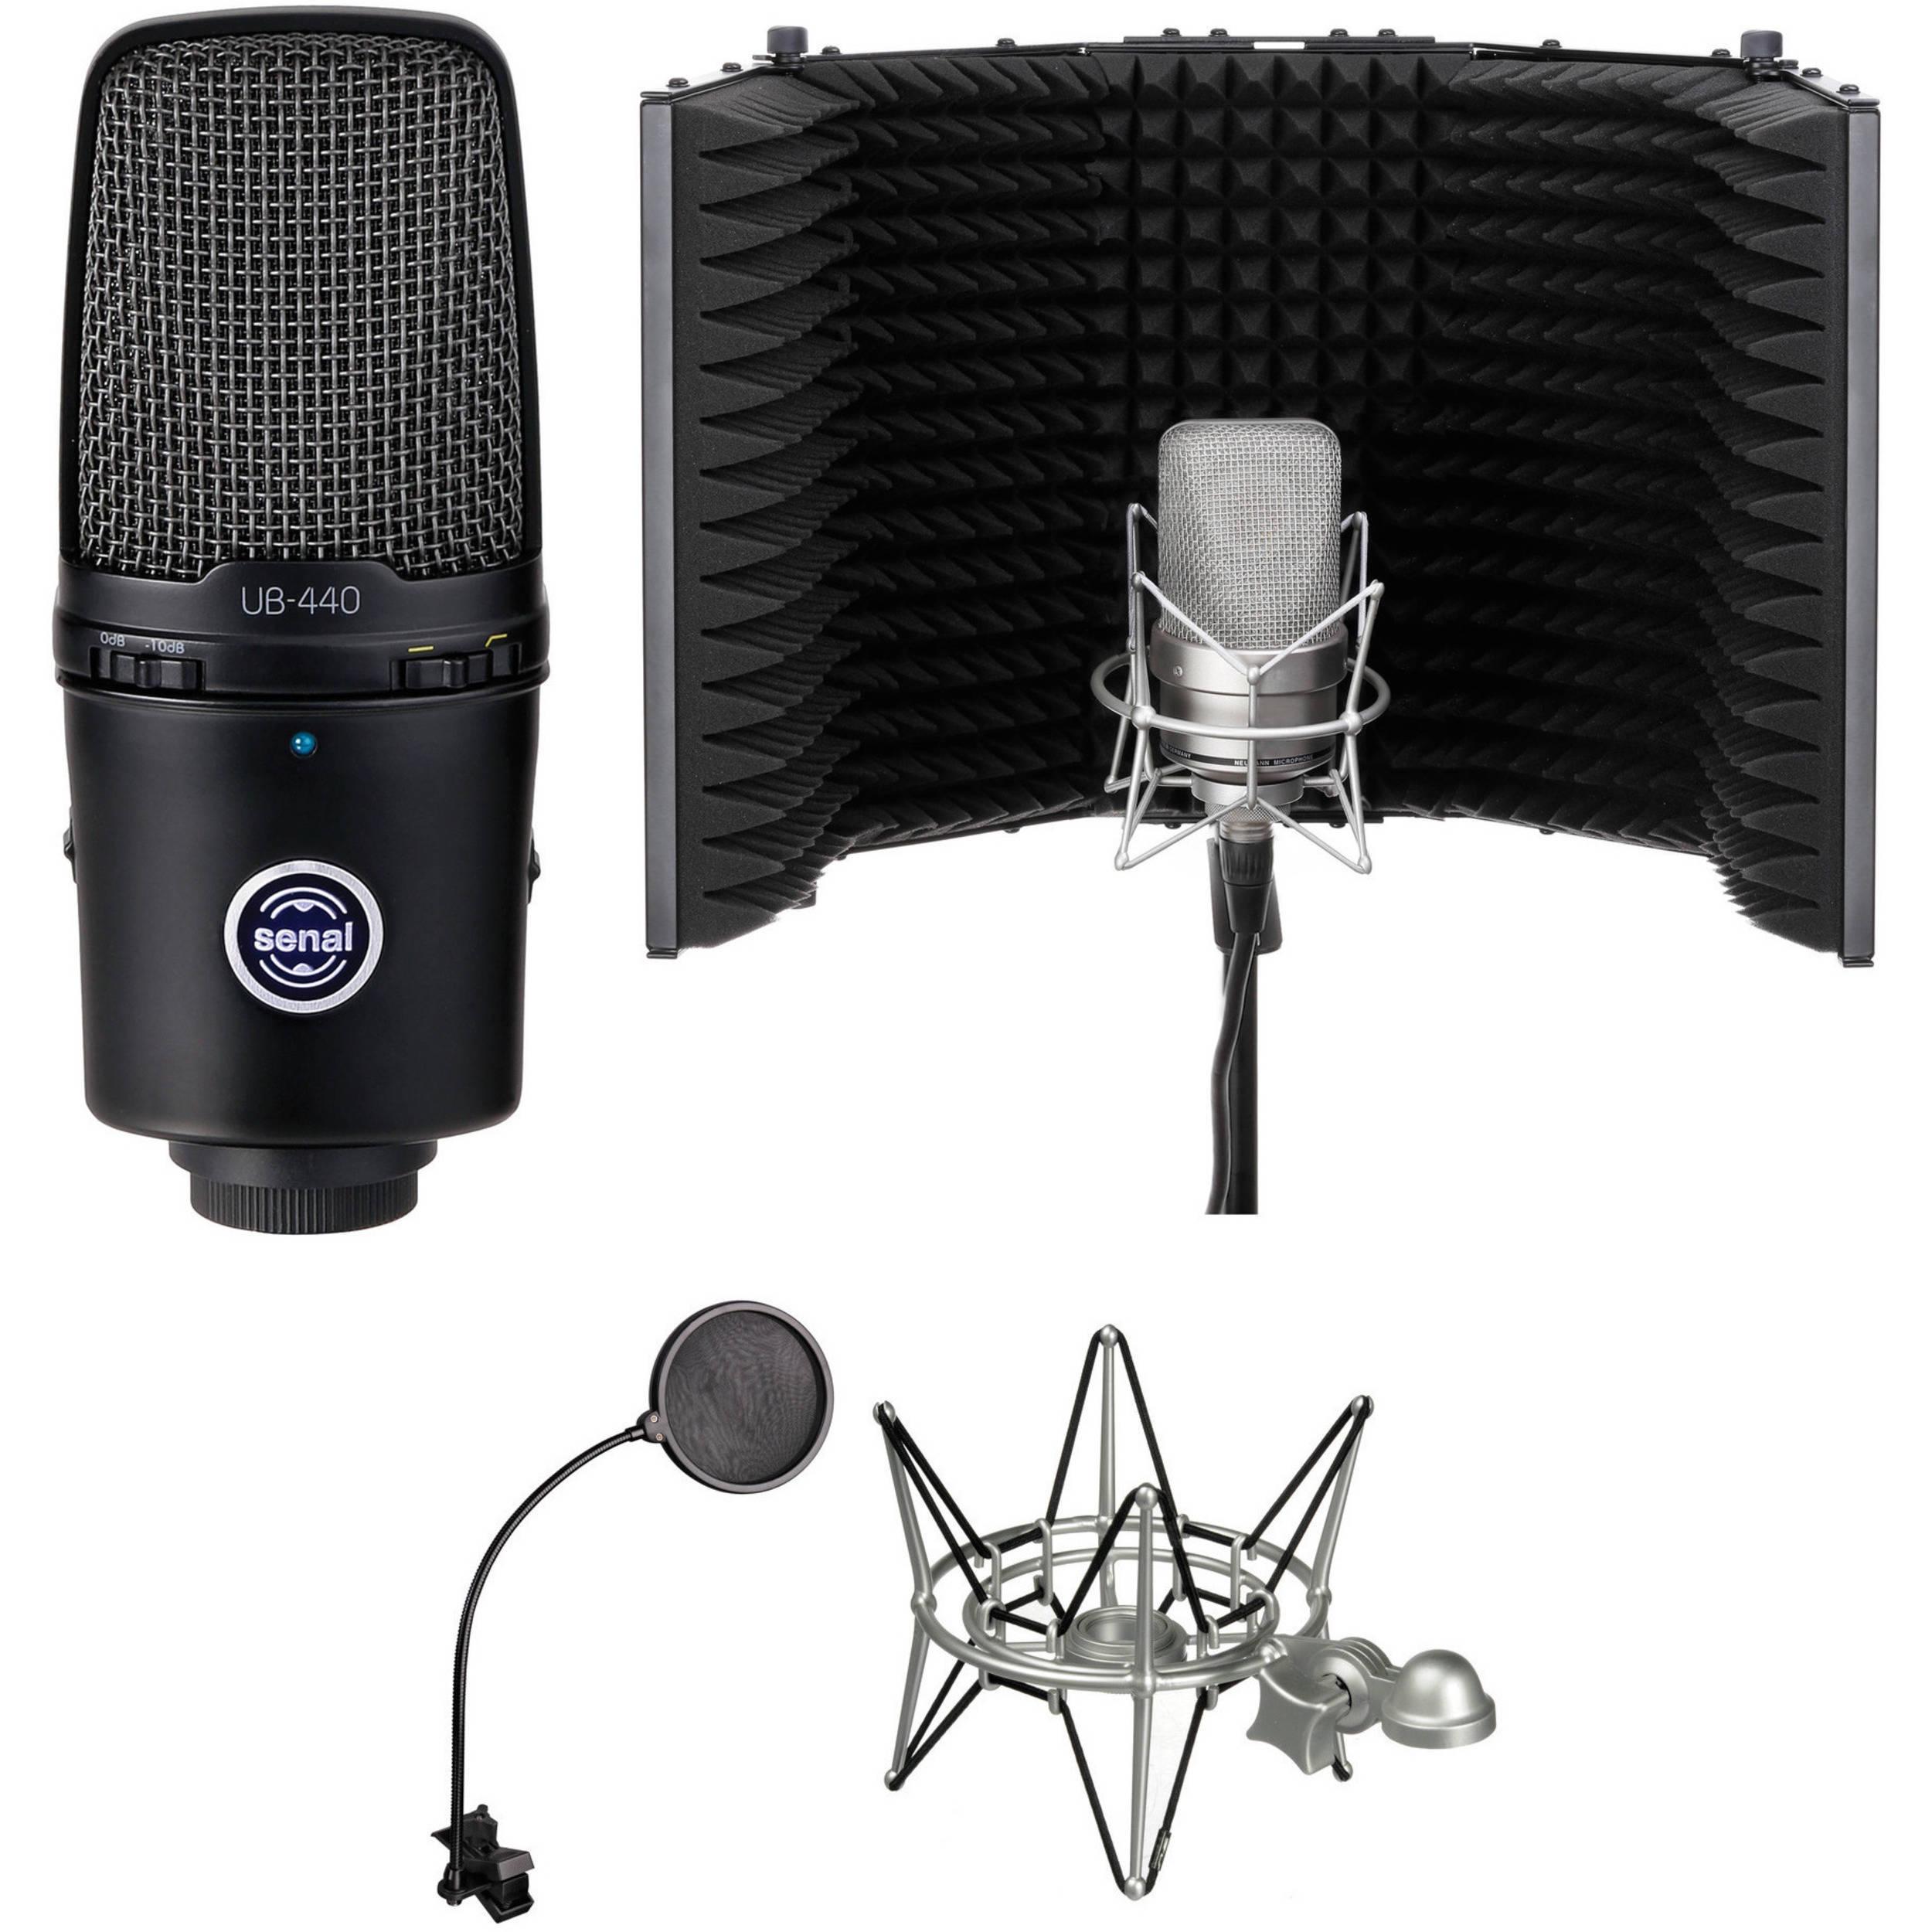 senal ub 440 usb mic desktop recording kit ub 440 k2 b h photo. Black Bedroom Furniture Sets. Home Design Ideas